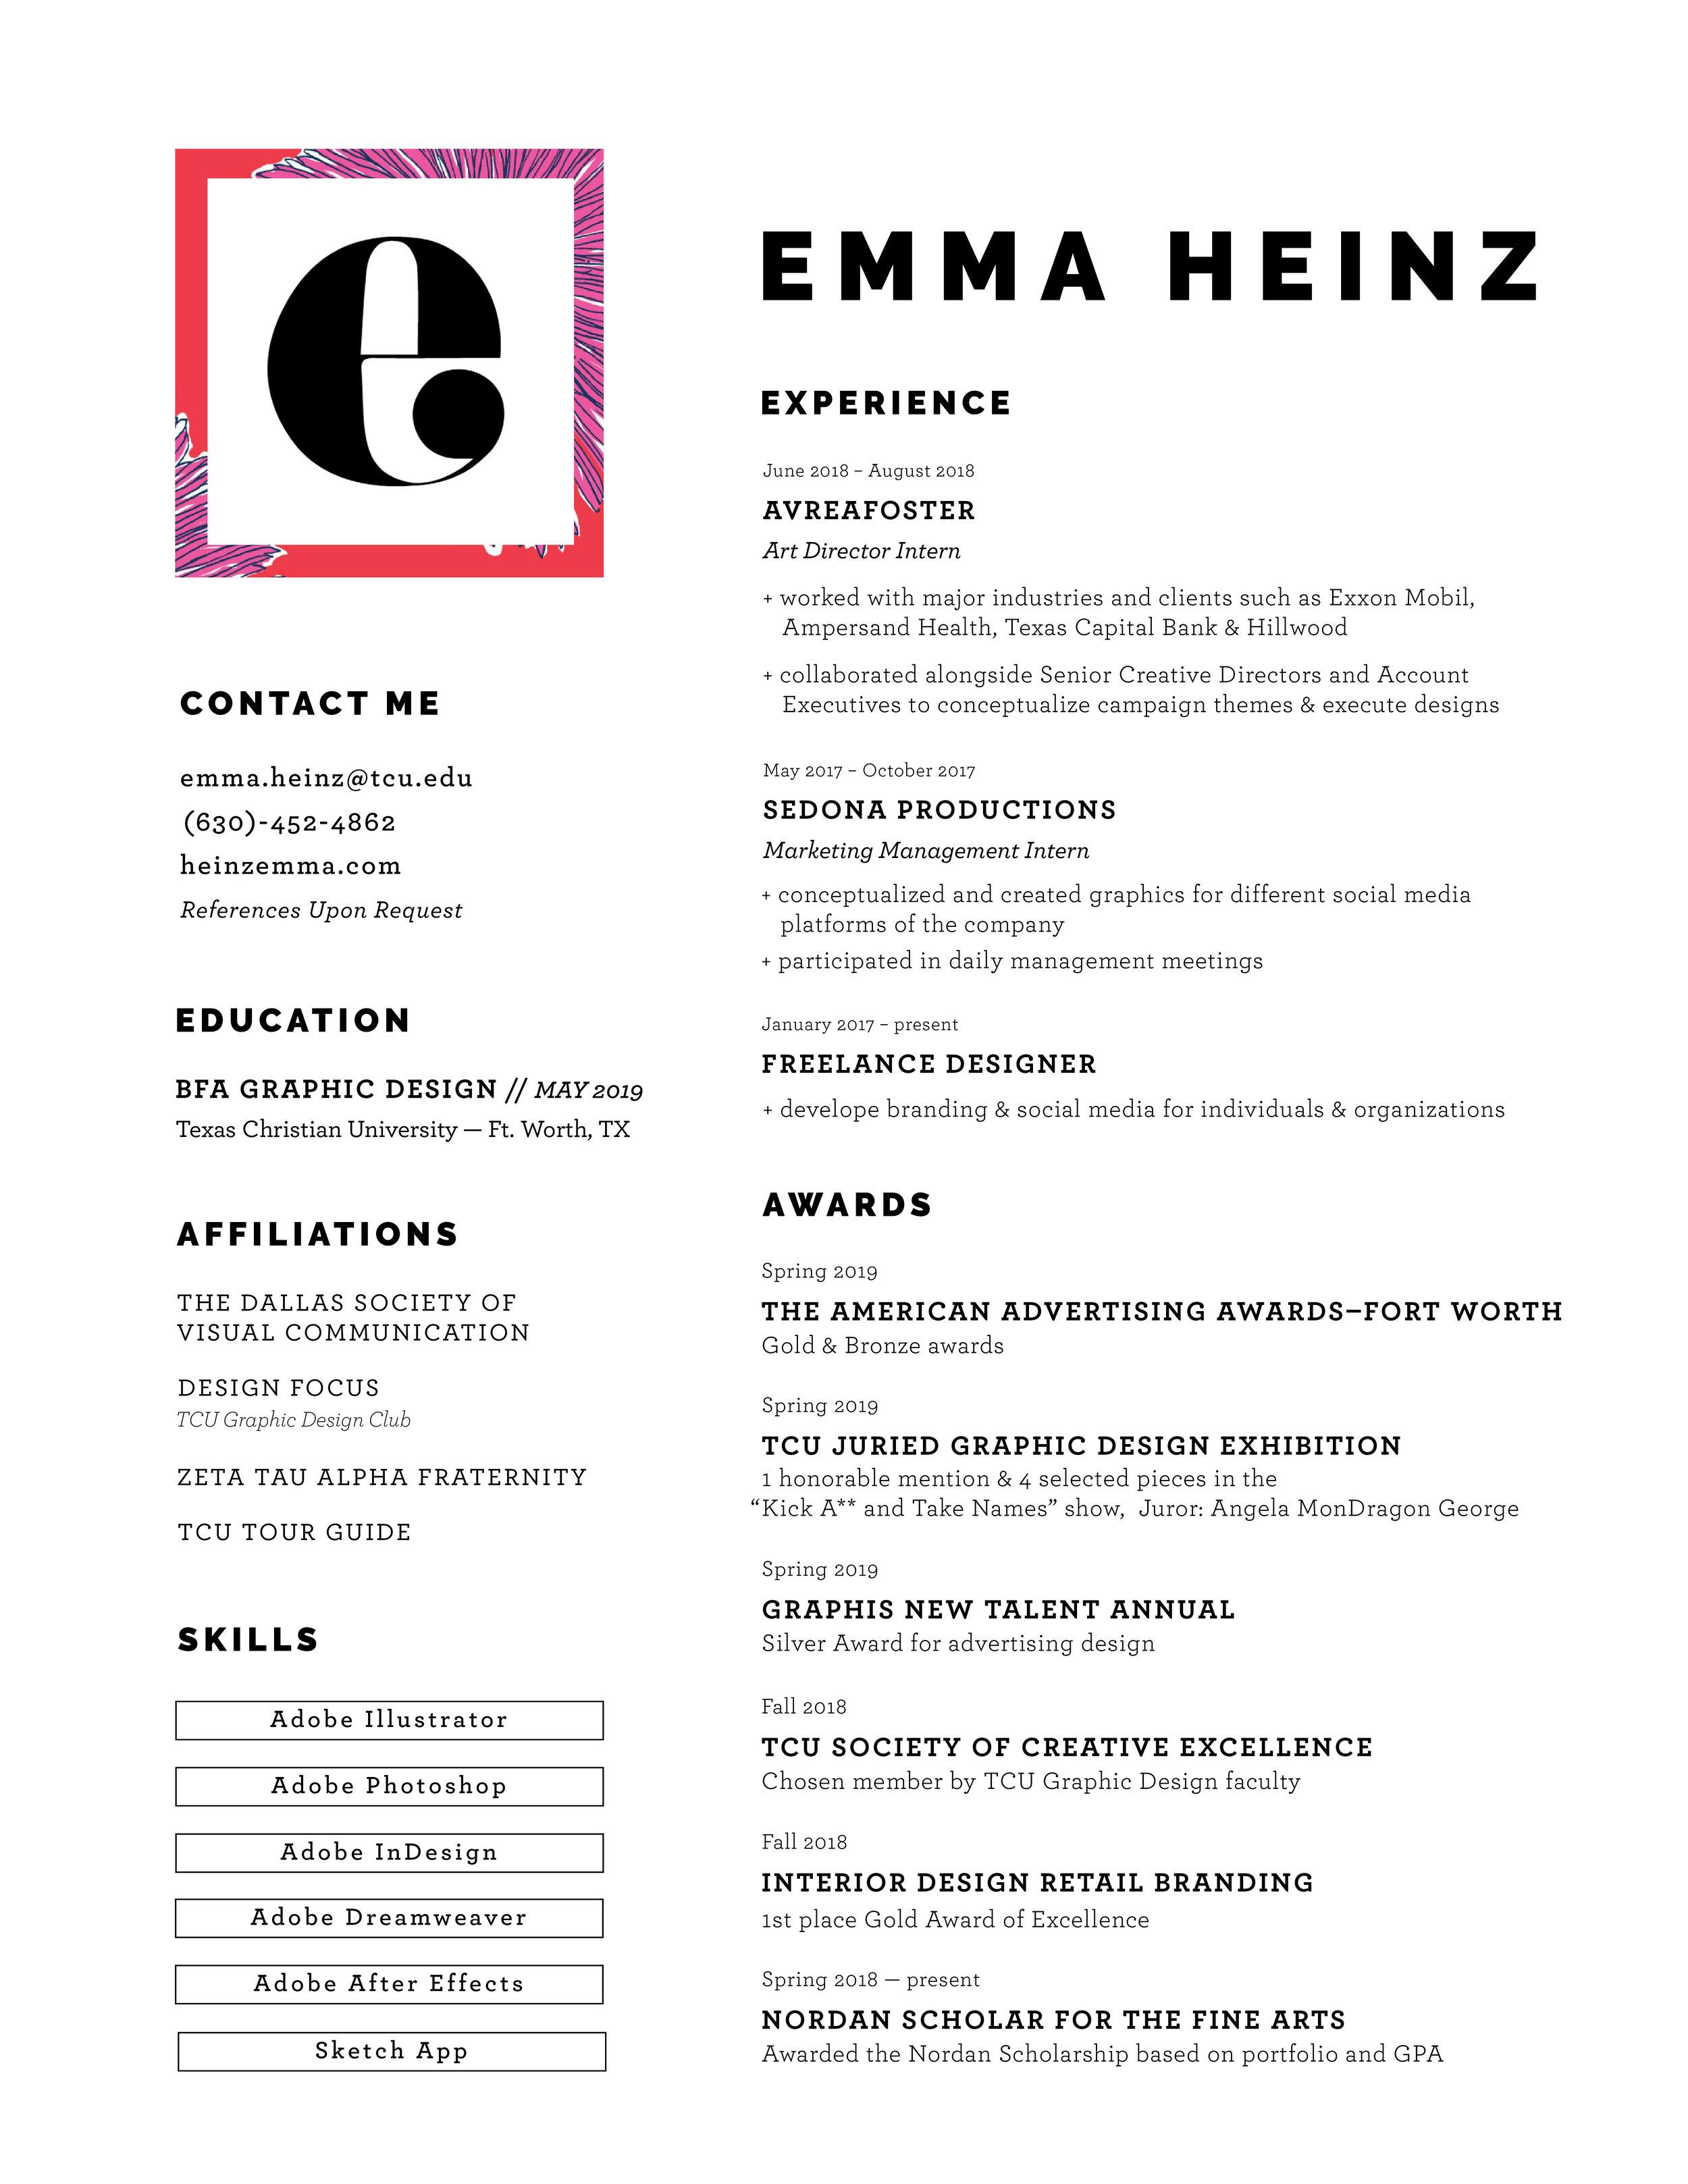 Resume 2.28.19.jpg